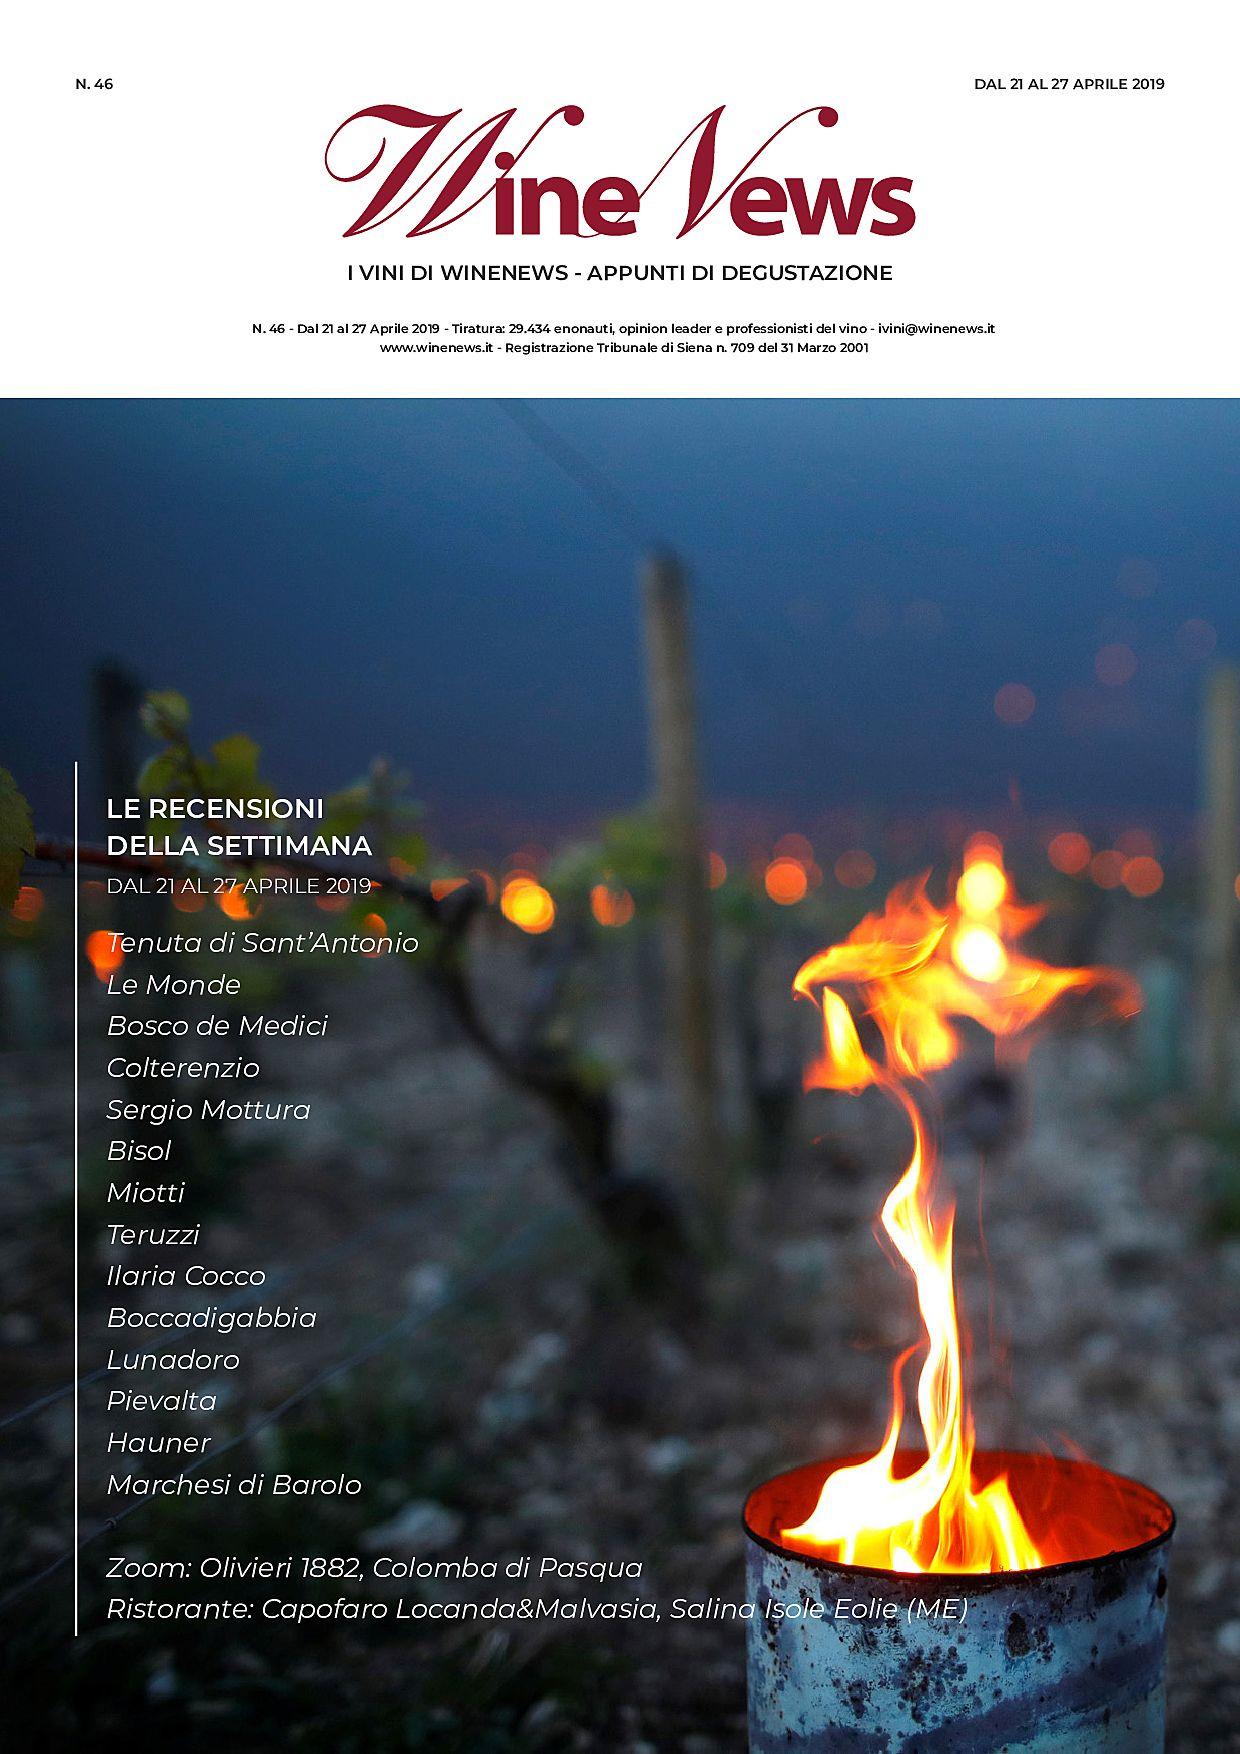 https://winenews.it/php/redirect_pdf.php?id=389223&t=1555677826